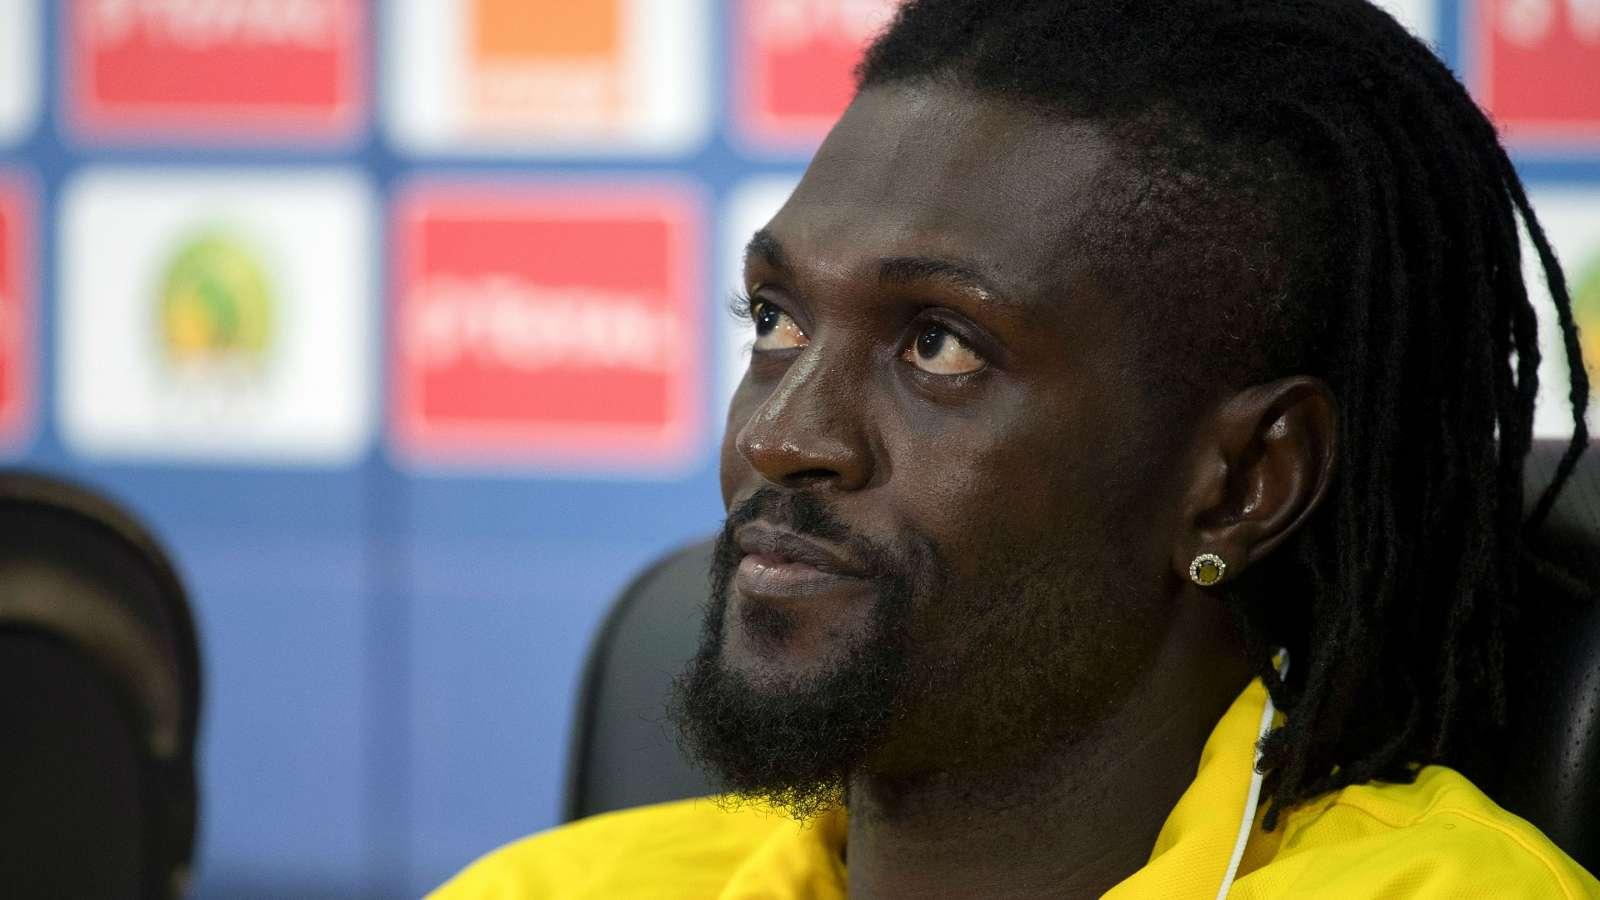 آرسنال-توگو-لیگ برتر-رئال مادرید-Togo-Real Madrid-Arsenal-Premier League